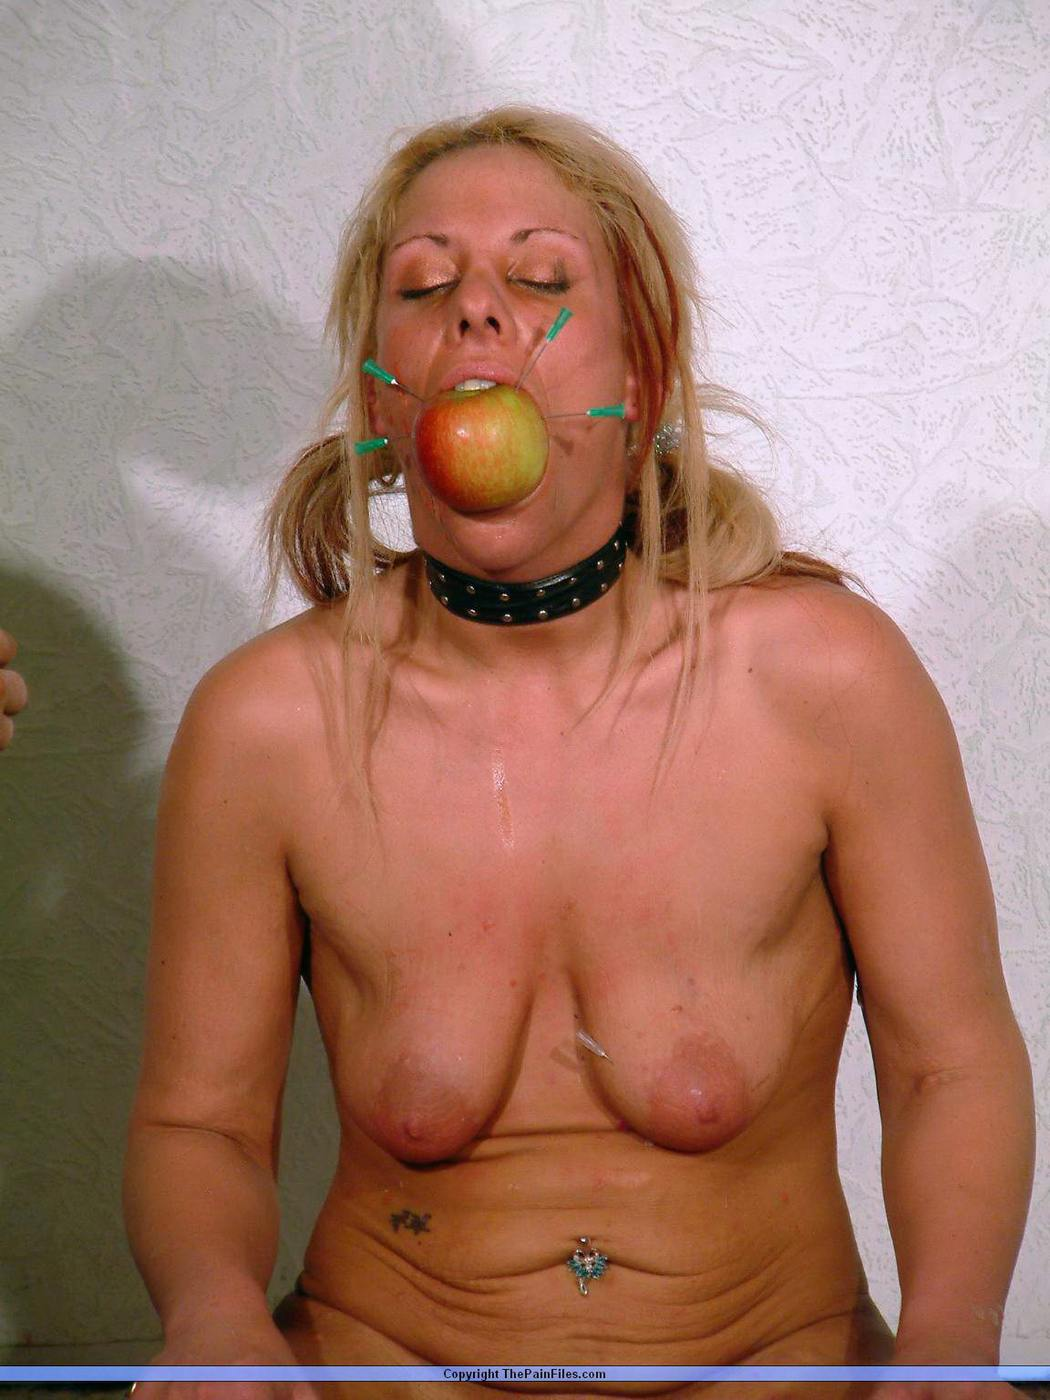 hot sexy girls naked gifs blow job